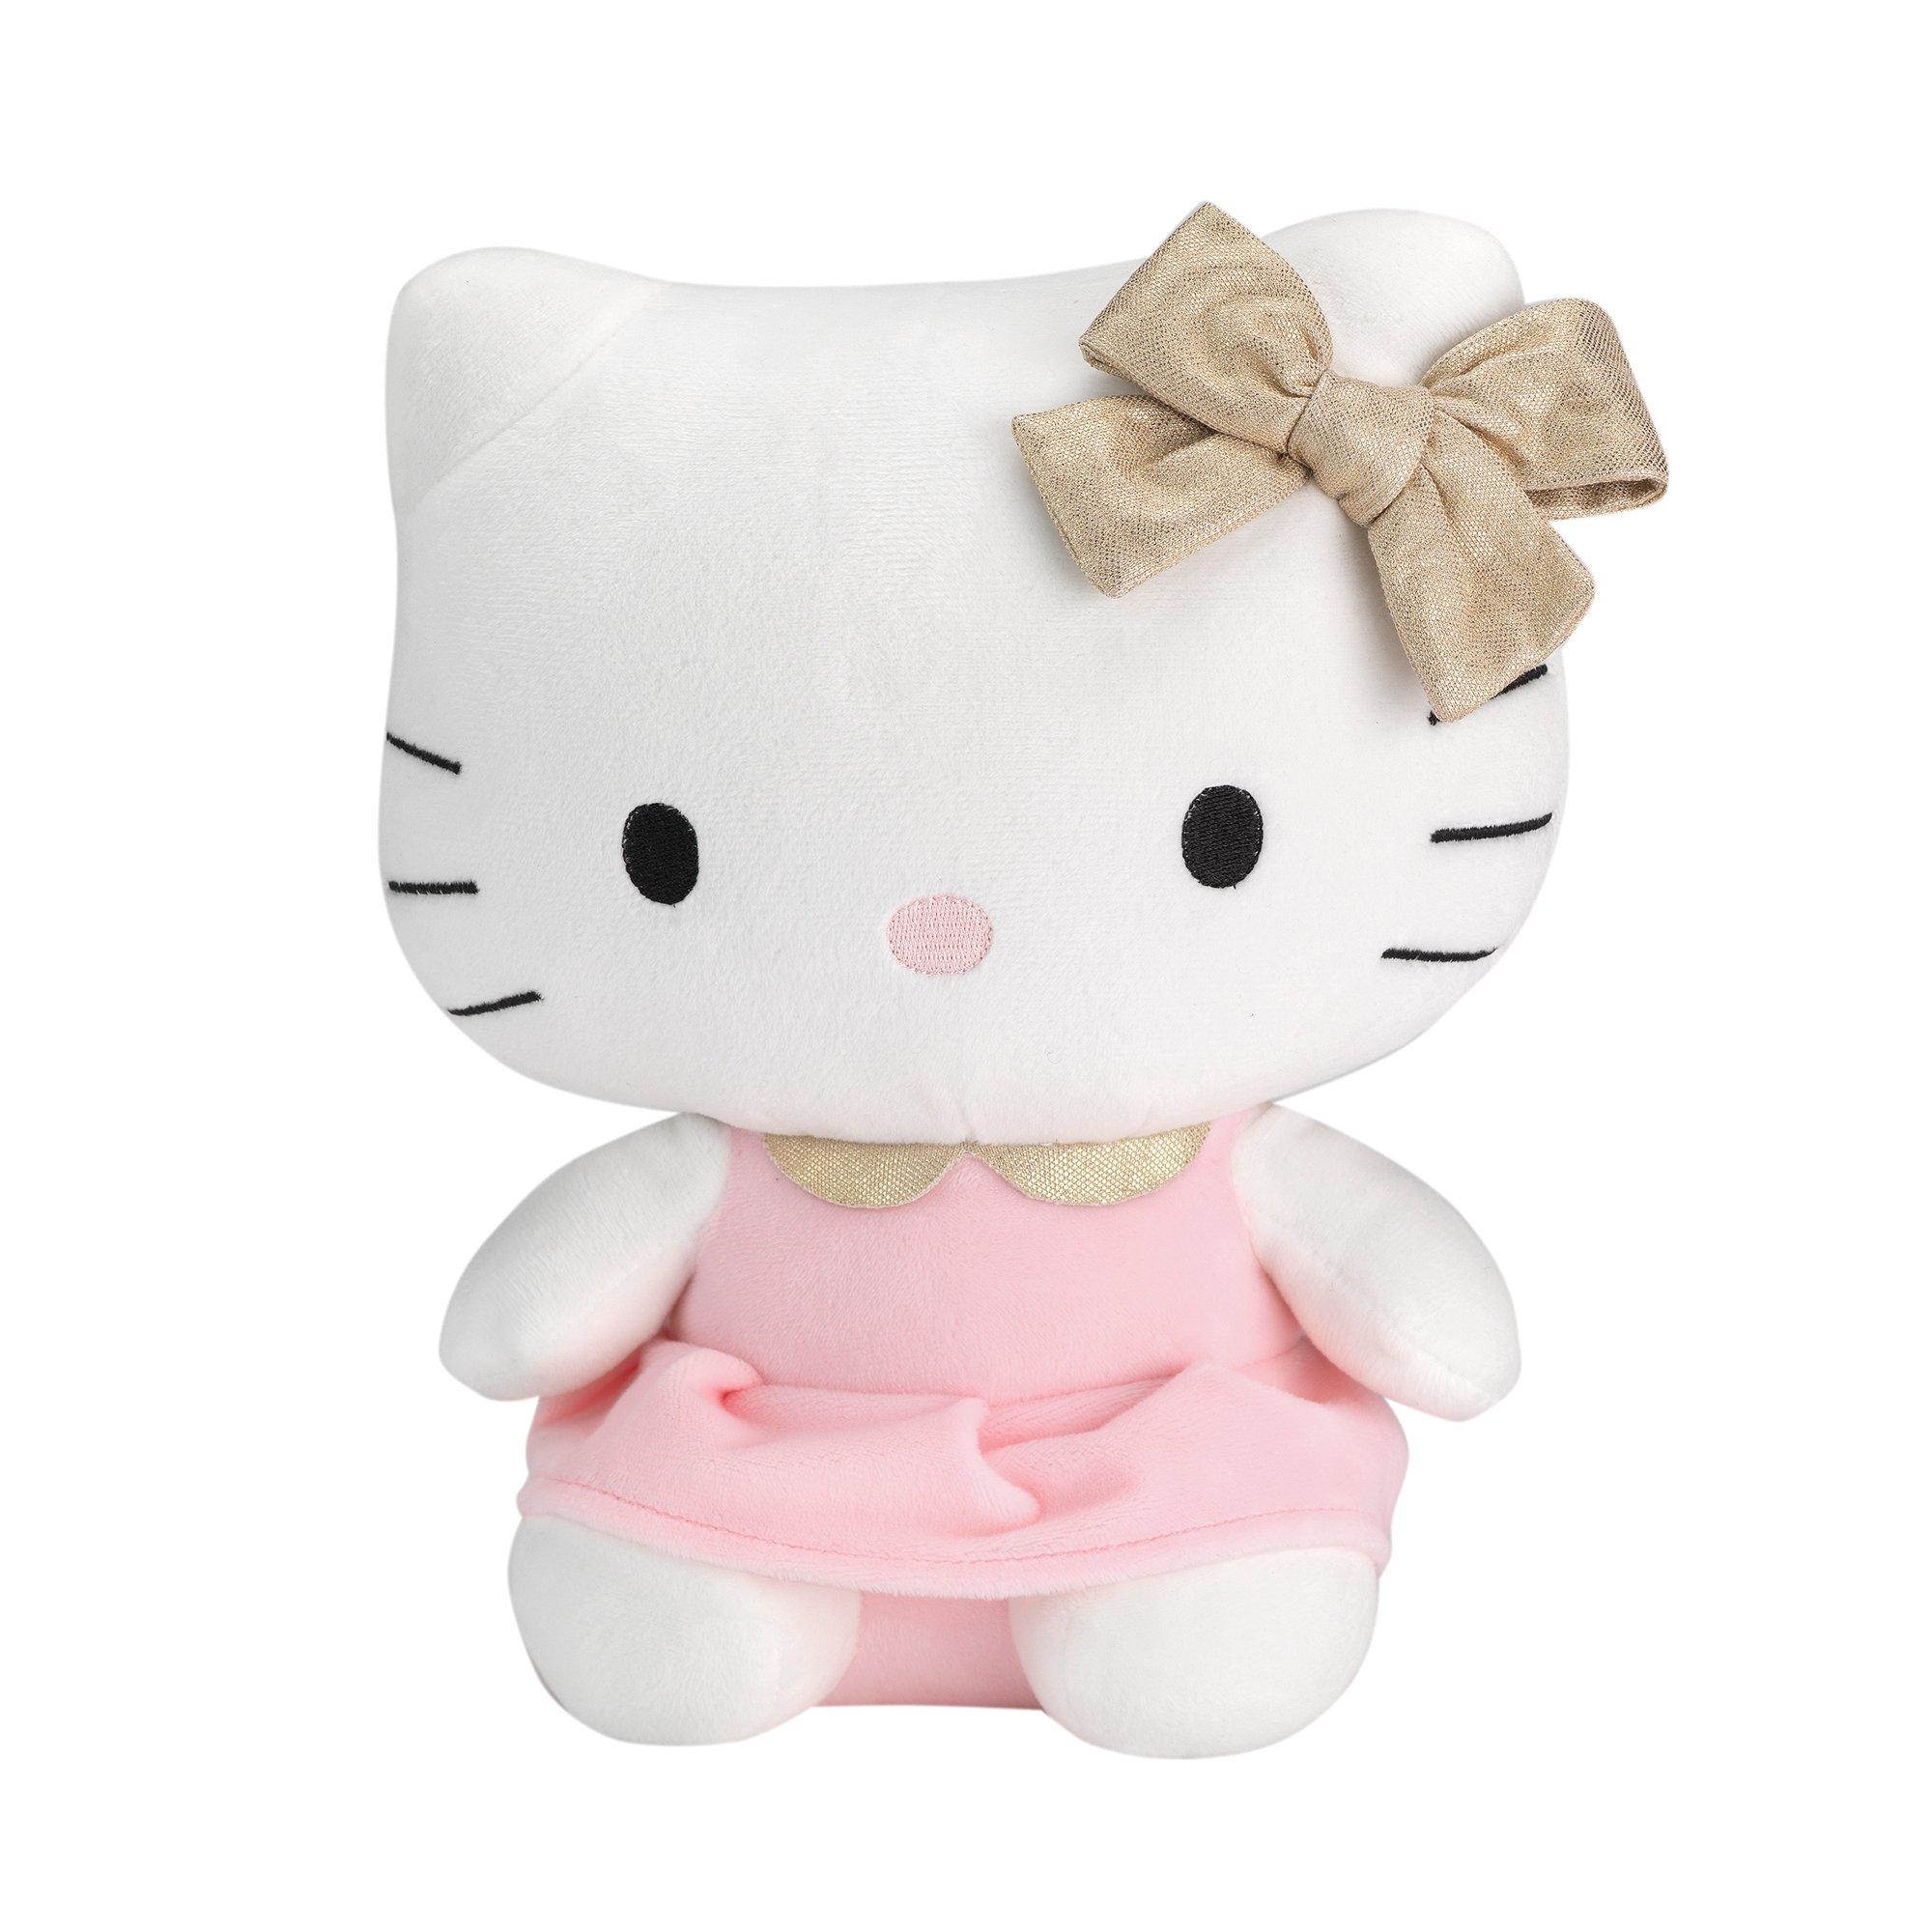 Lambs & Ivy Hello Kitty Plush, Pink/White